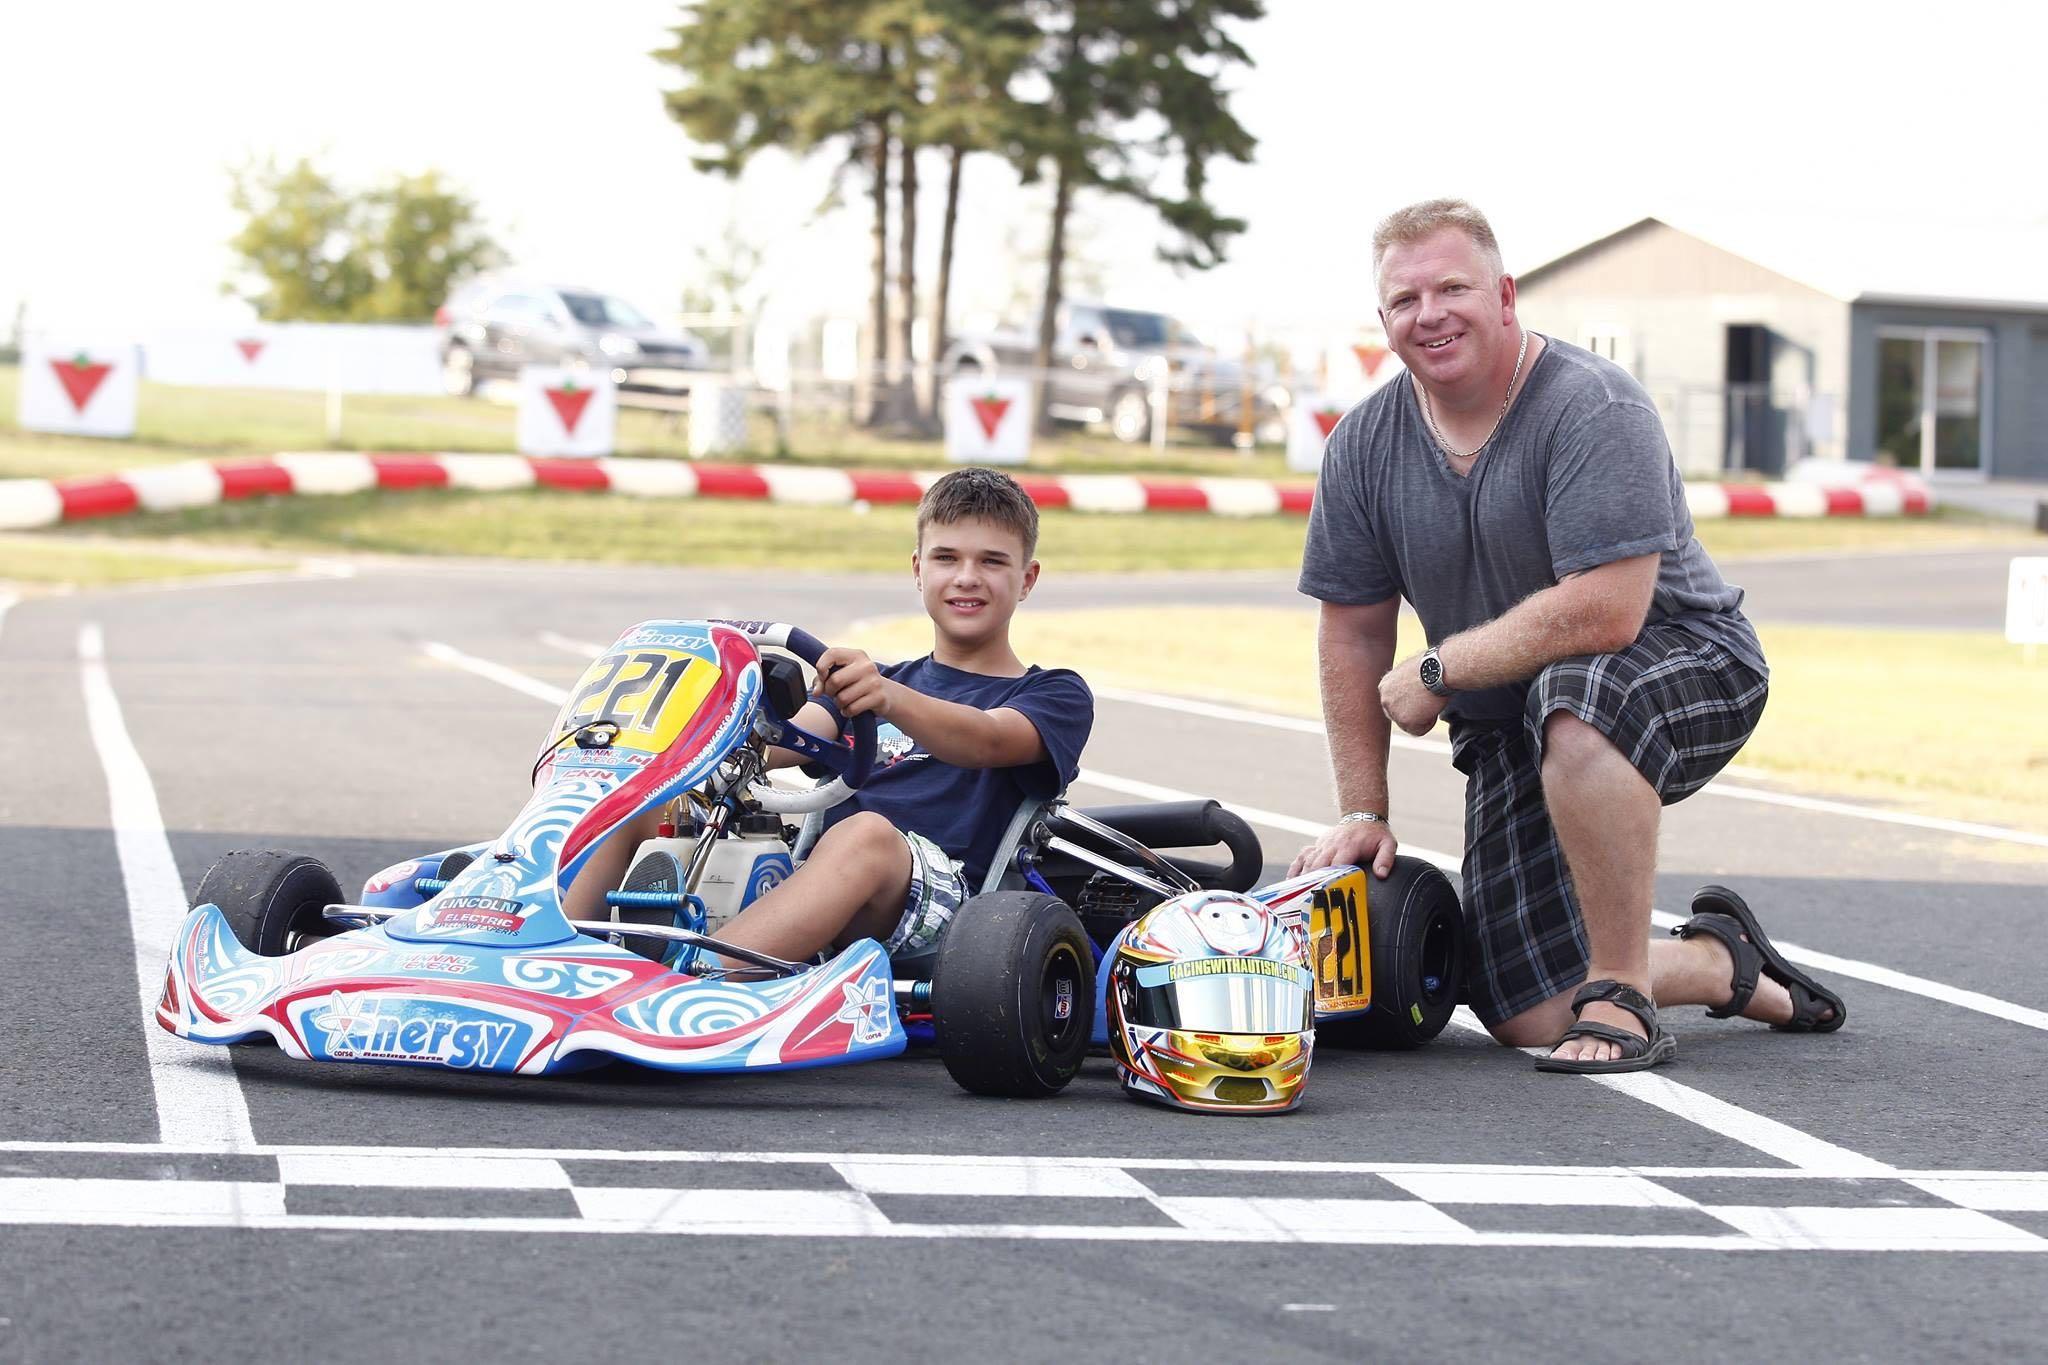 Racing with Autism Austin Riley kart